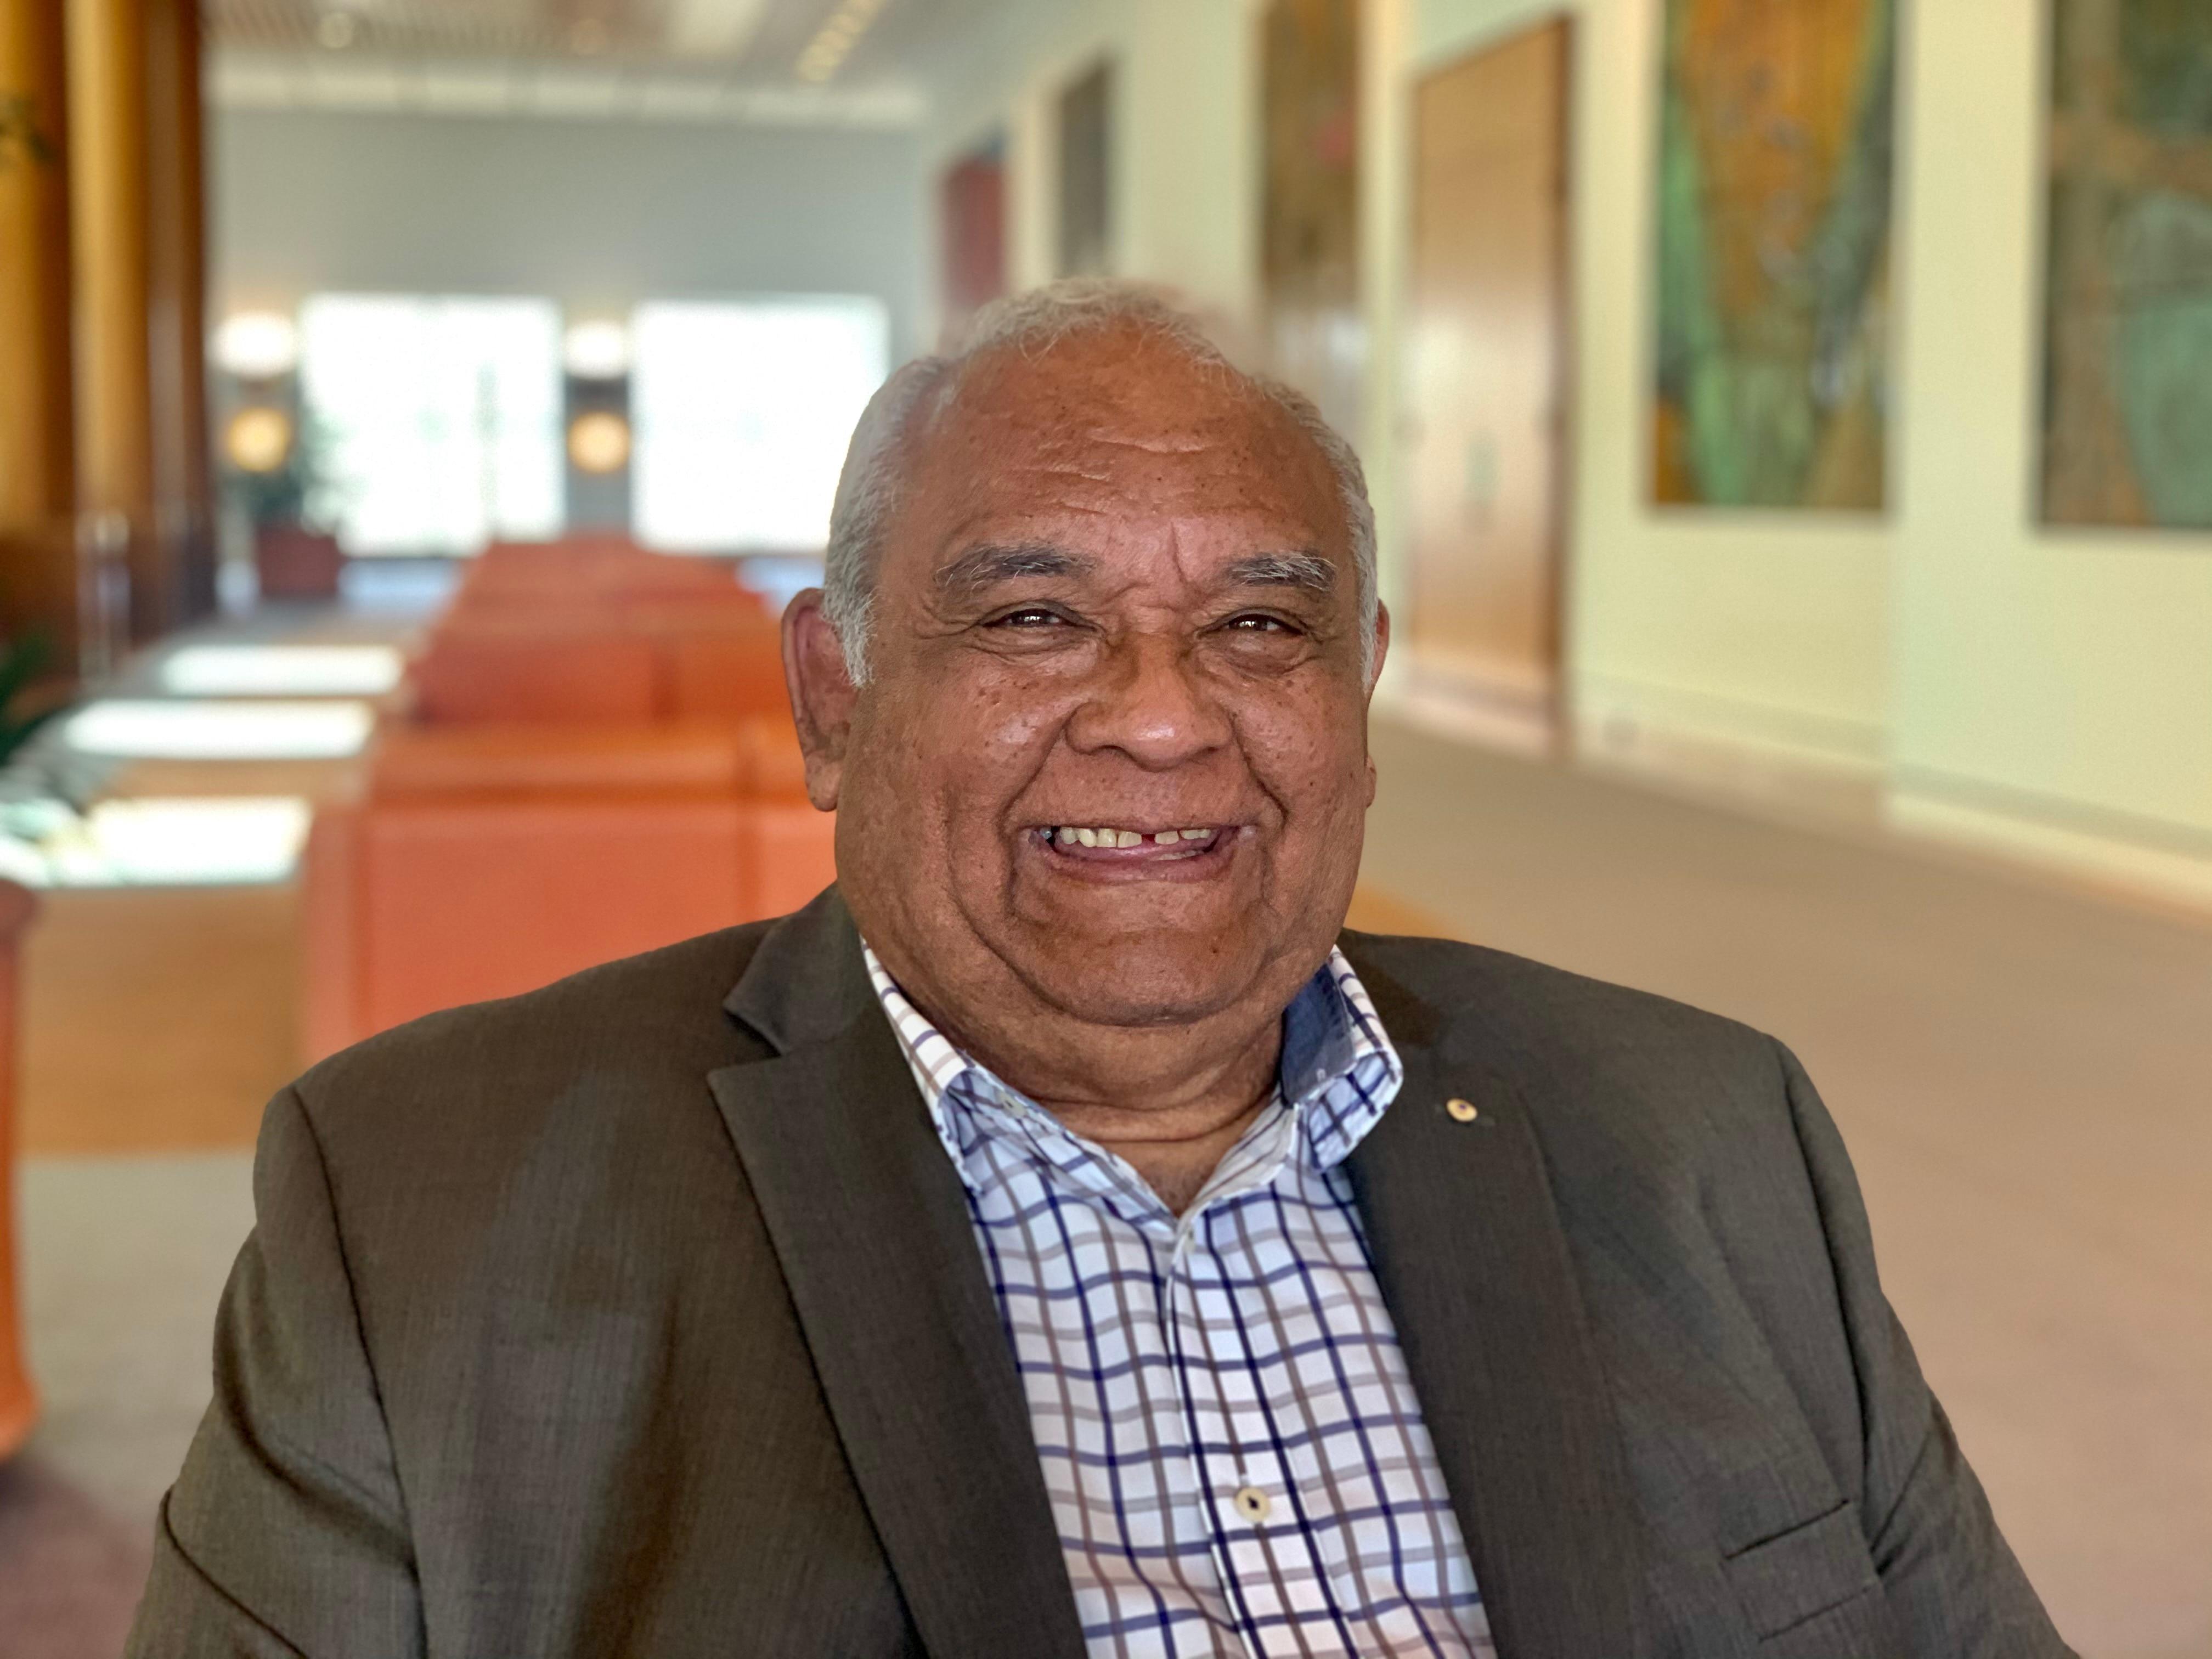 Professor Tom Calma is an Aboriginal Elder from the Kungarakan tribal group and a member of the Iwaidja tribal group.